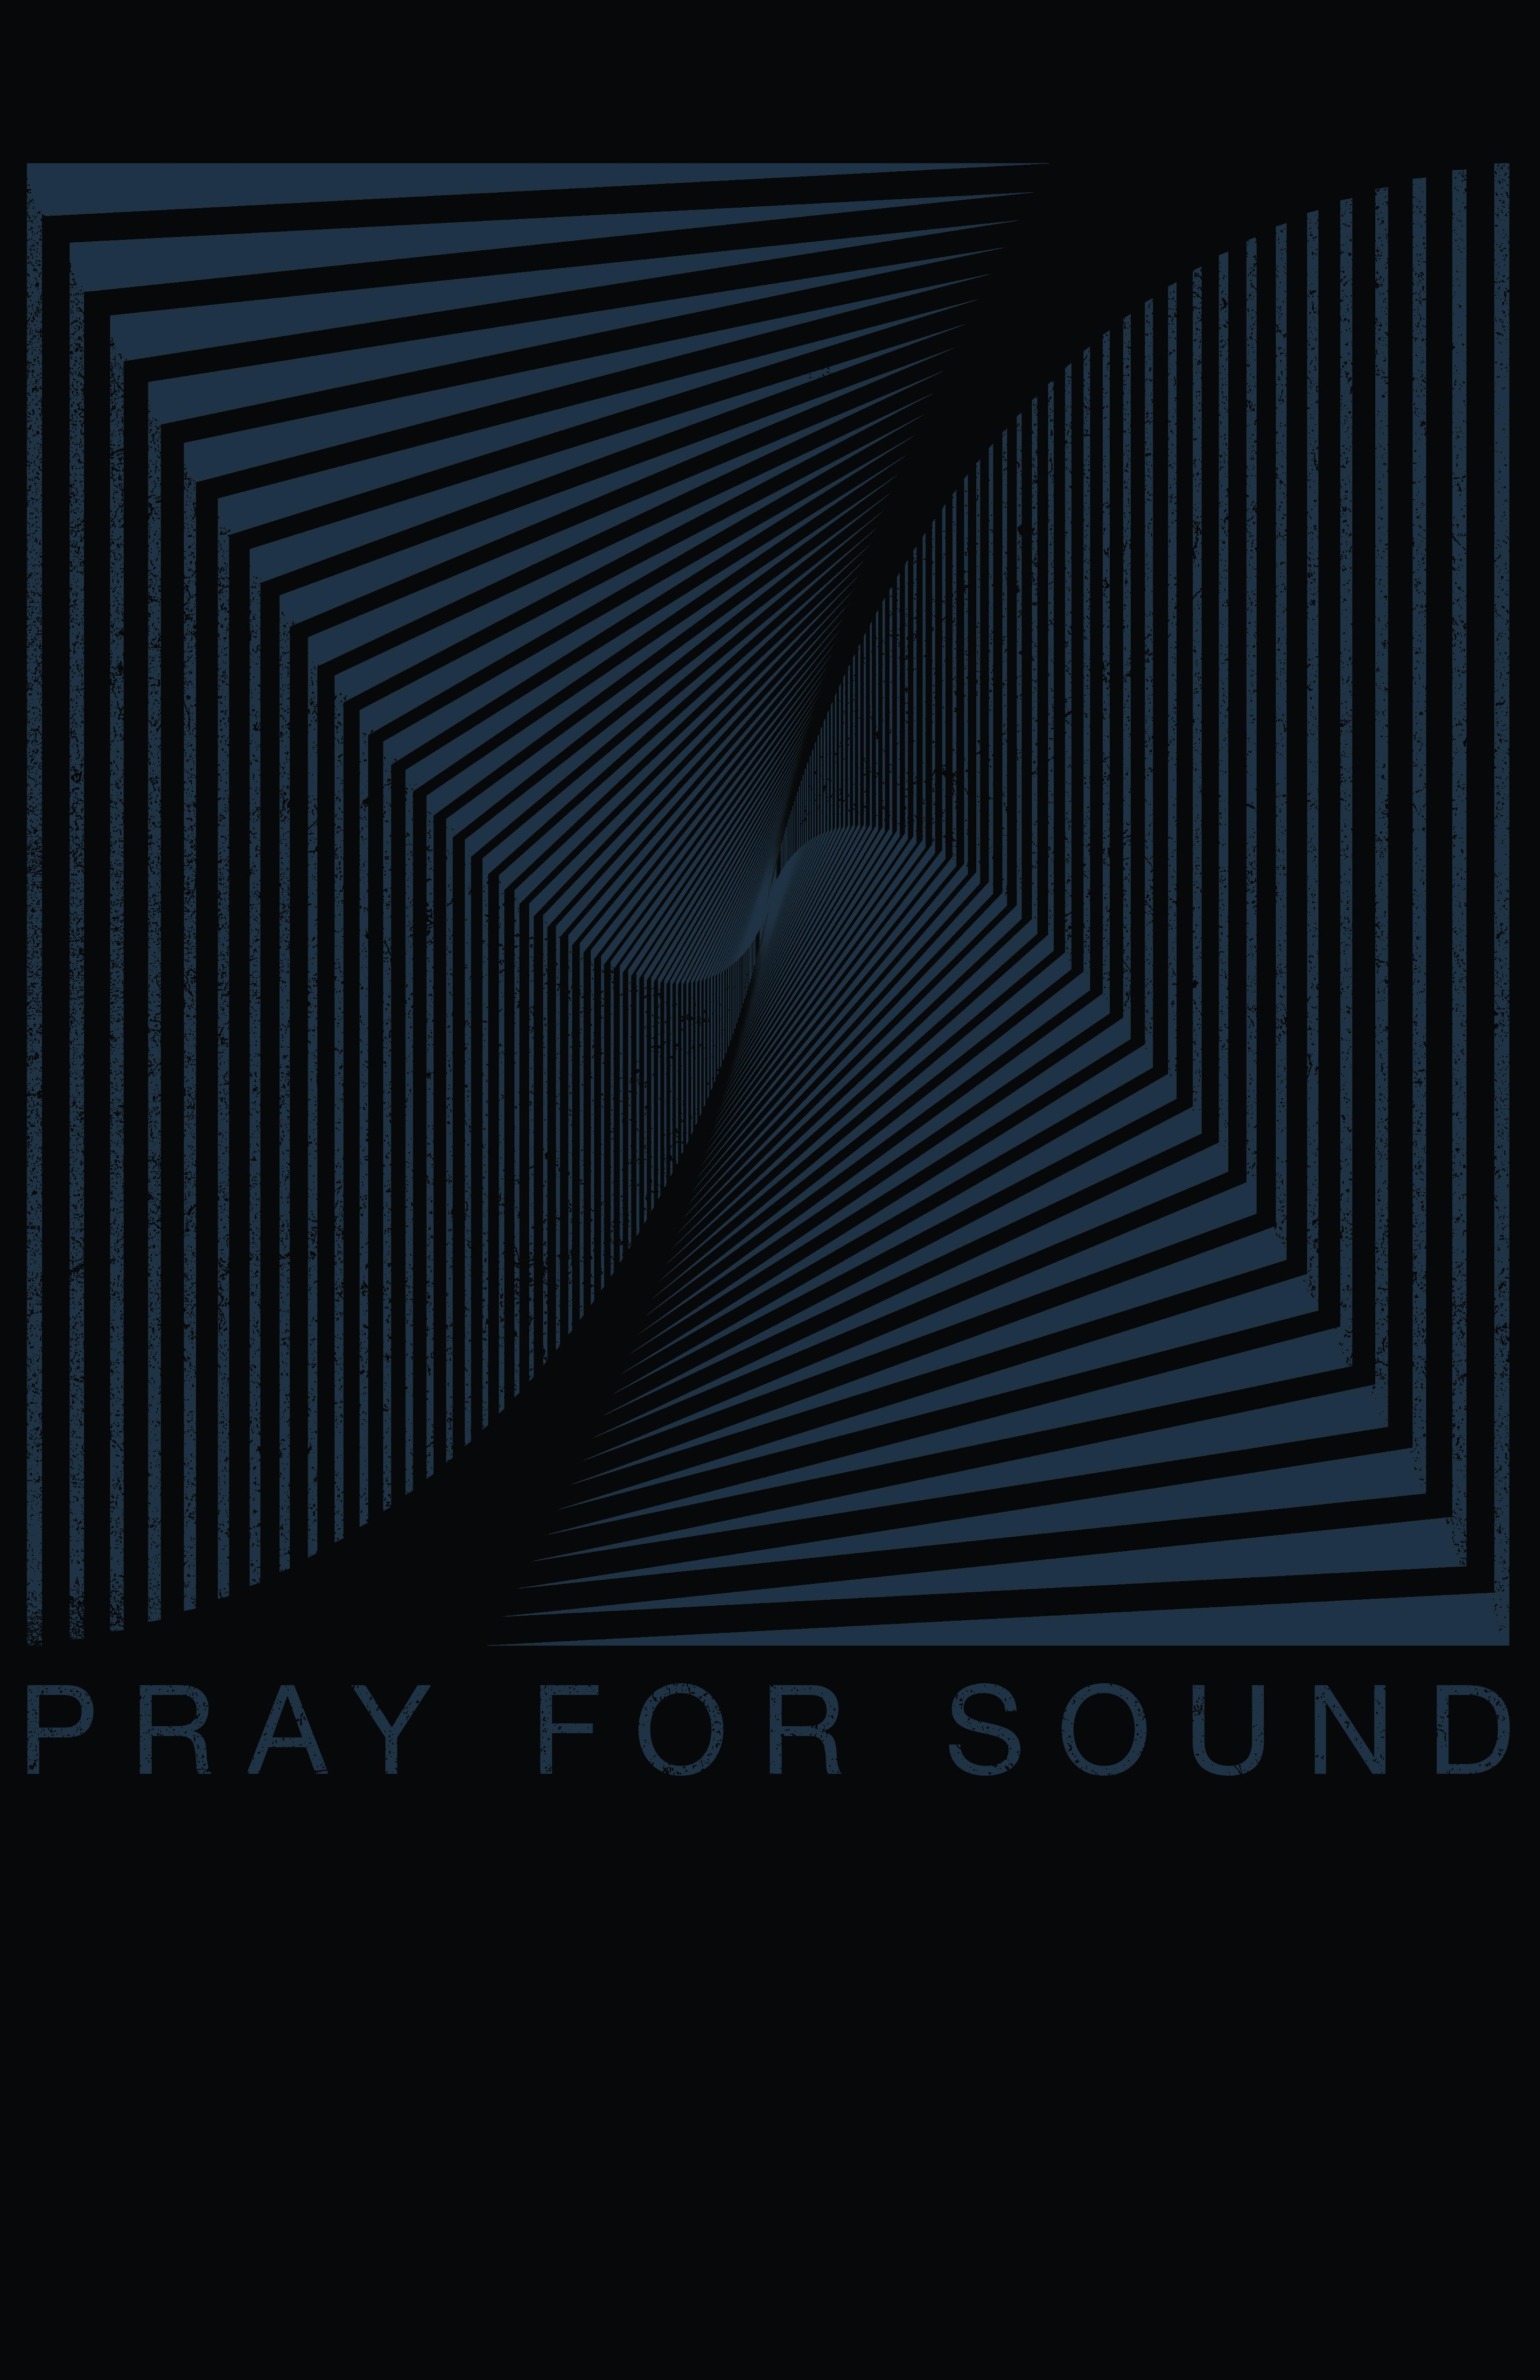 Pray For Sound - Cube Shirt